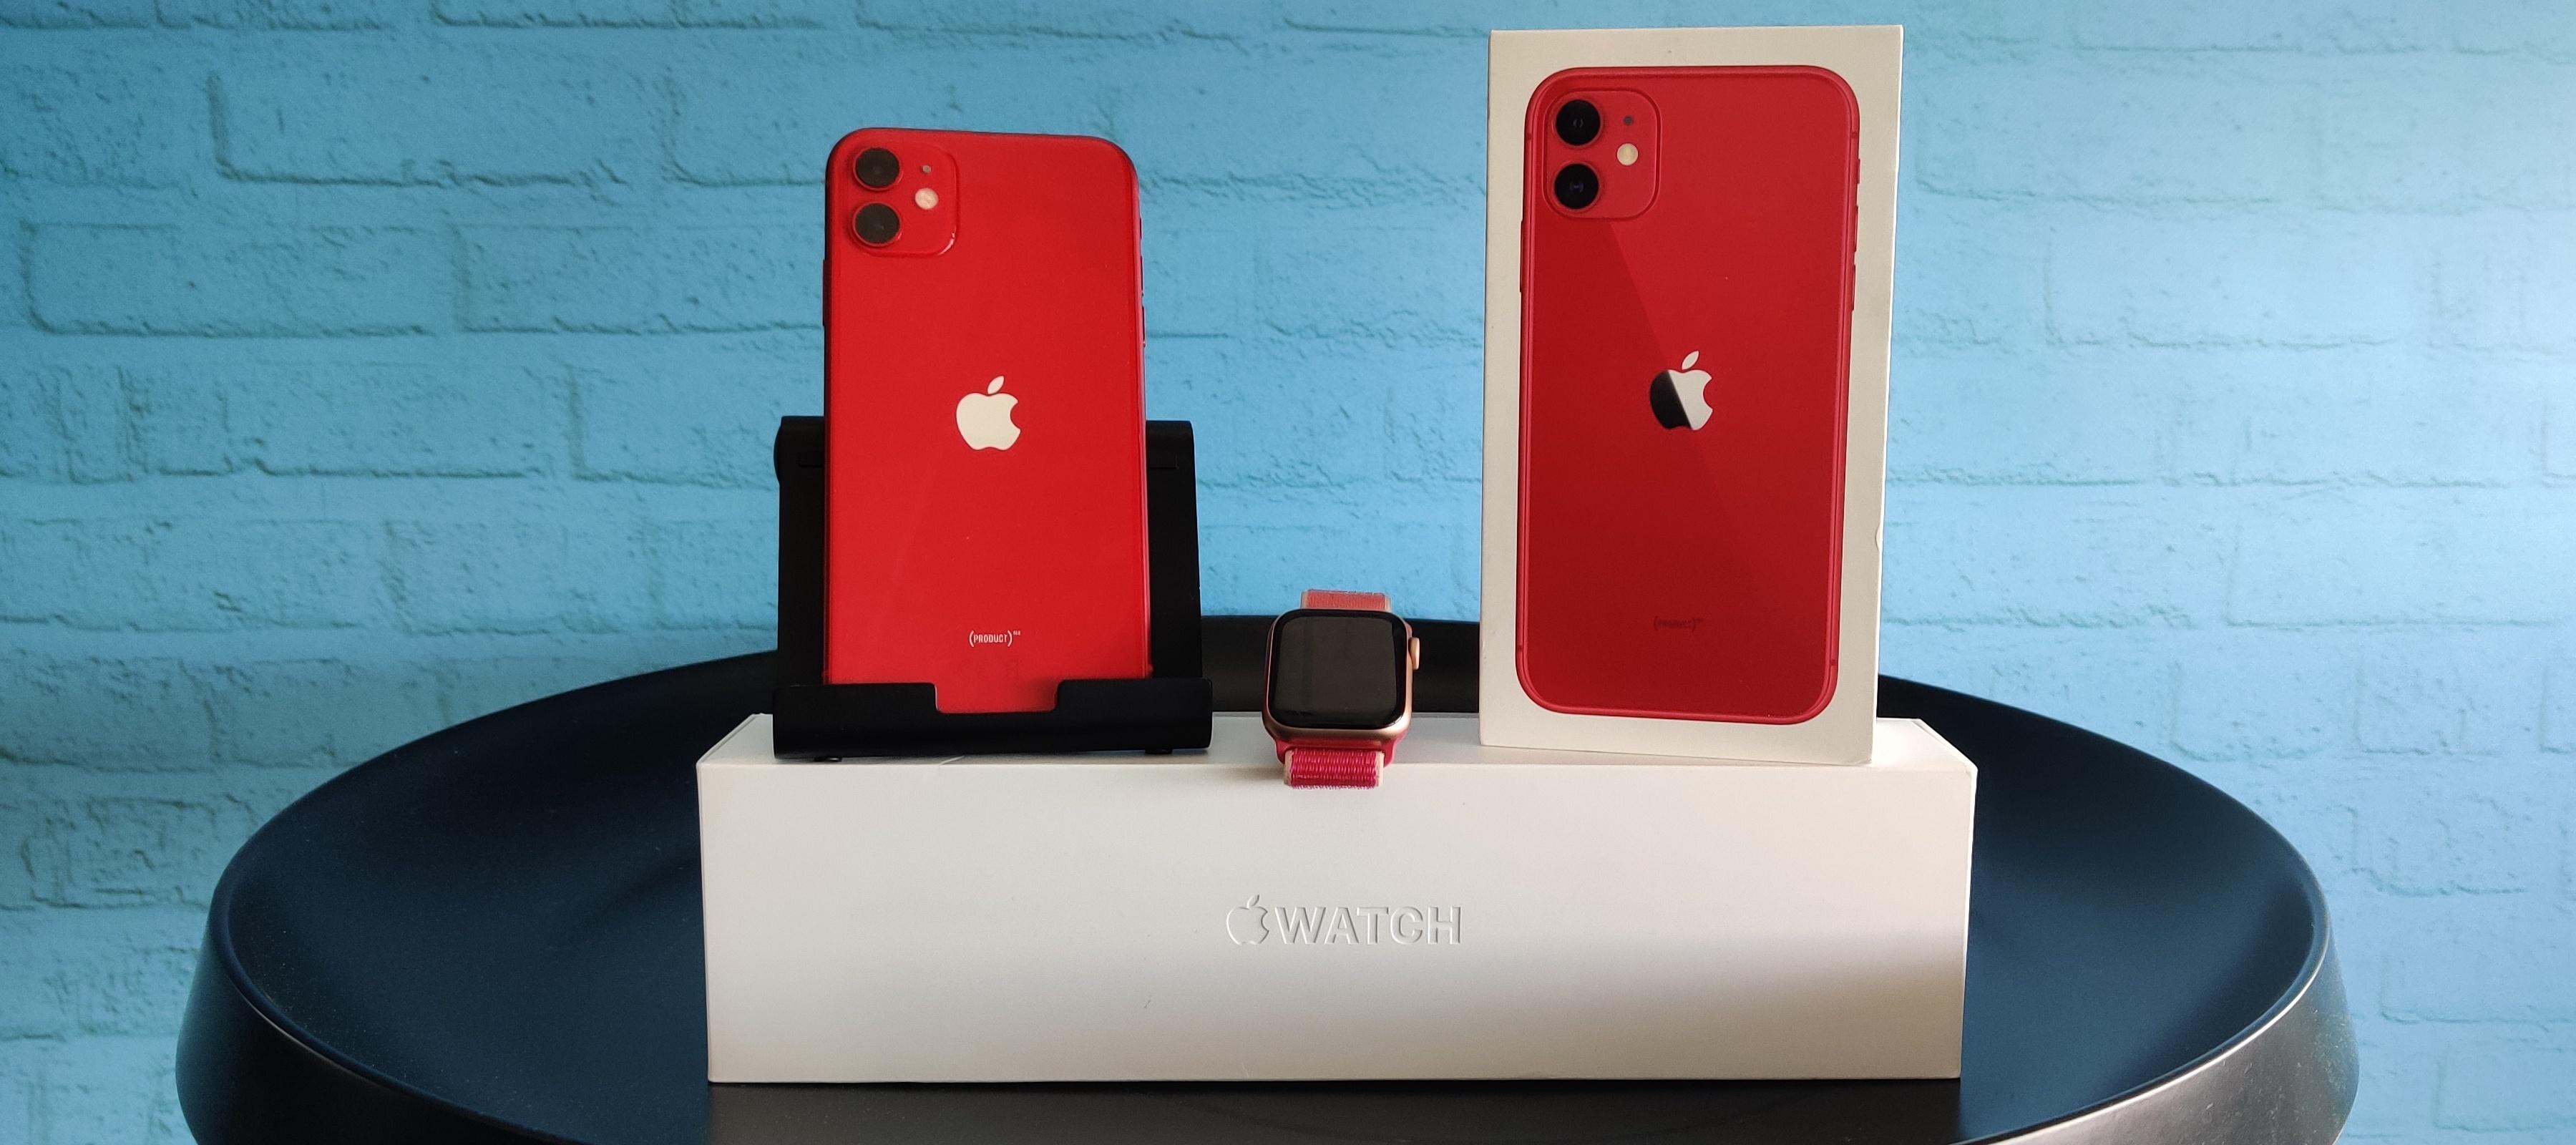 Apple Bundle: iPhone 11 & Apple Watch Series 5 - Produkttester gesucht